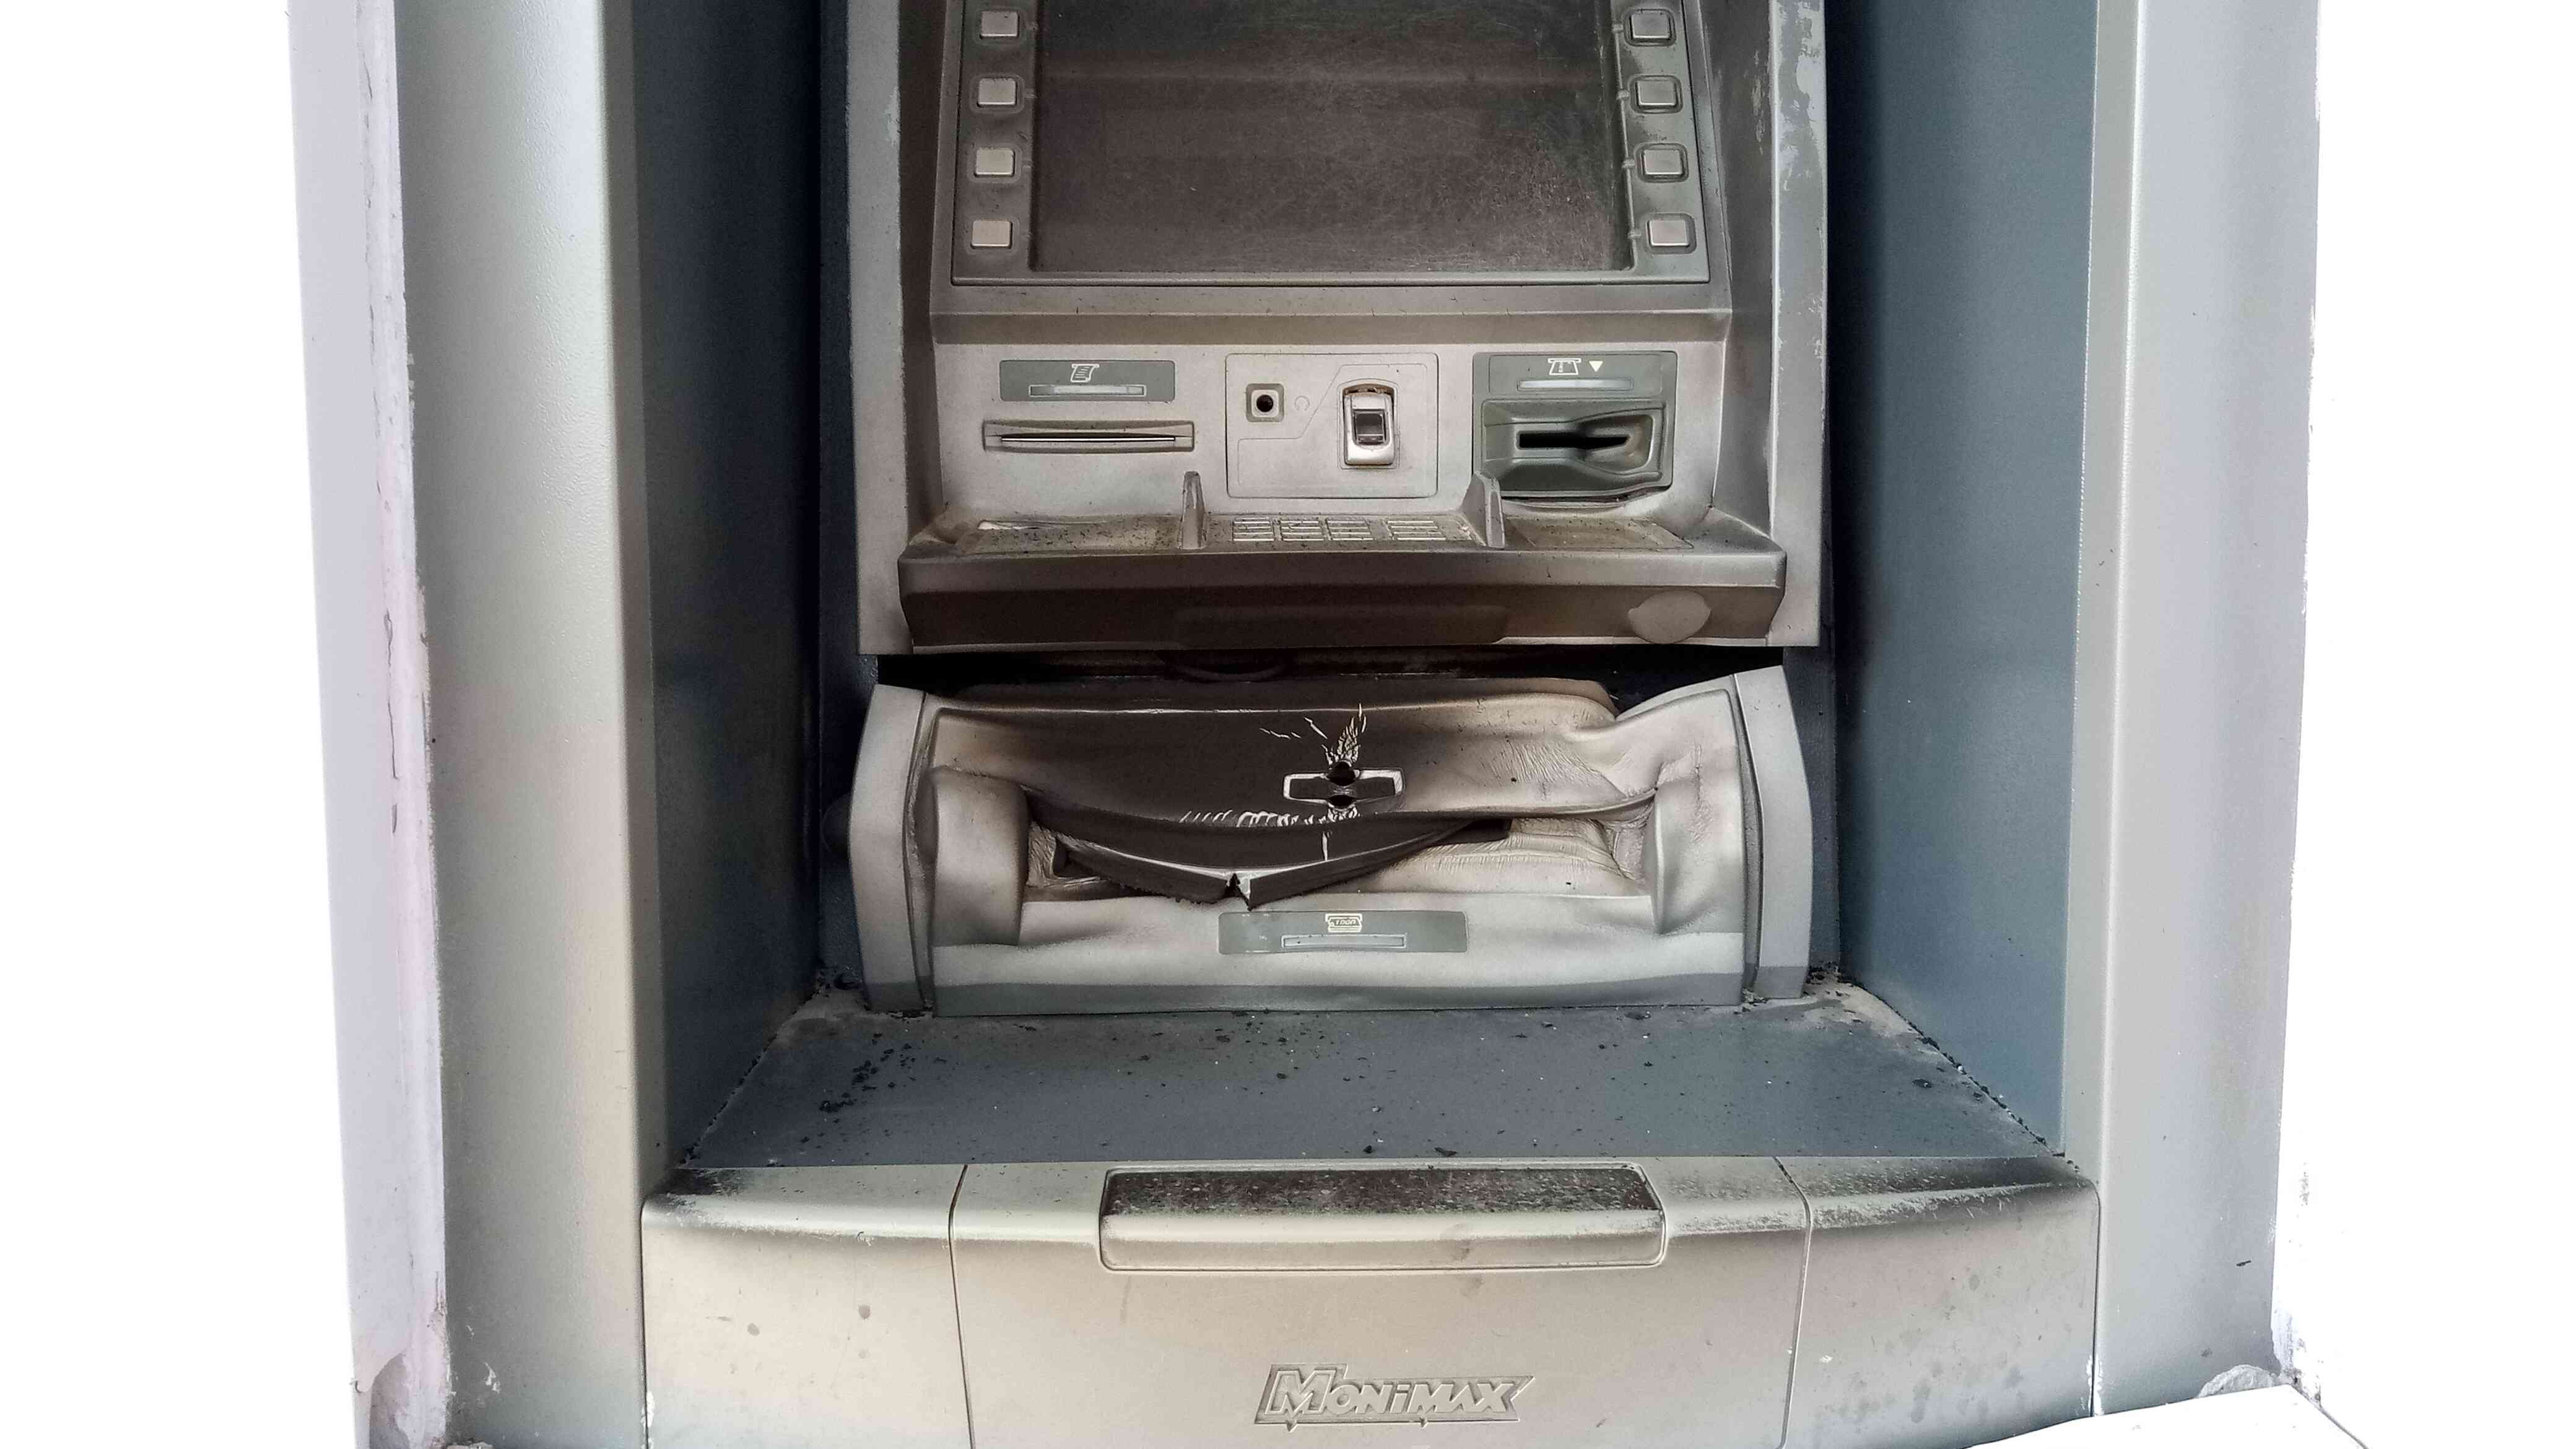 UofA: Mini Campus Access bank ATM stand Burgled